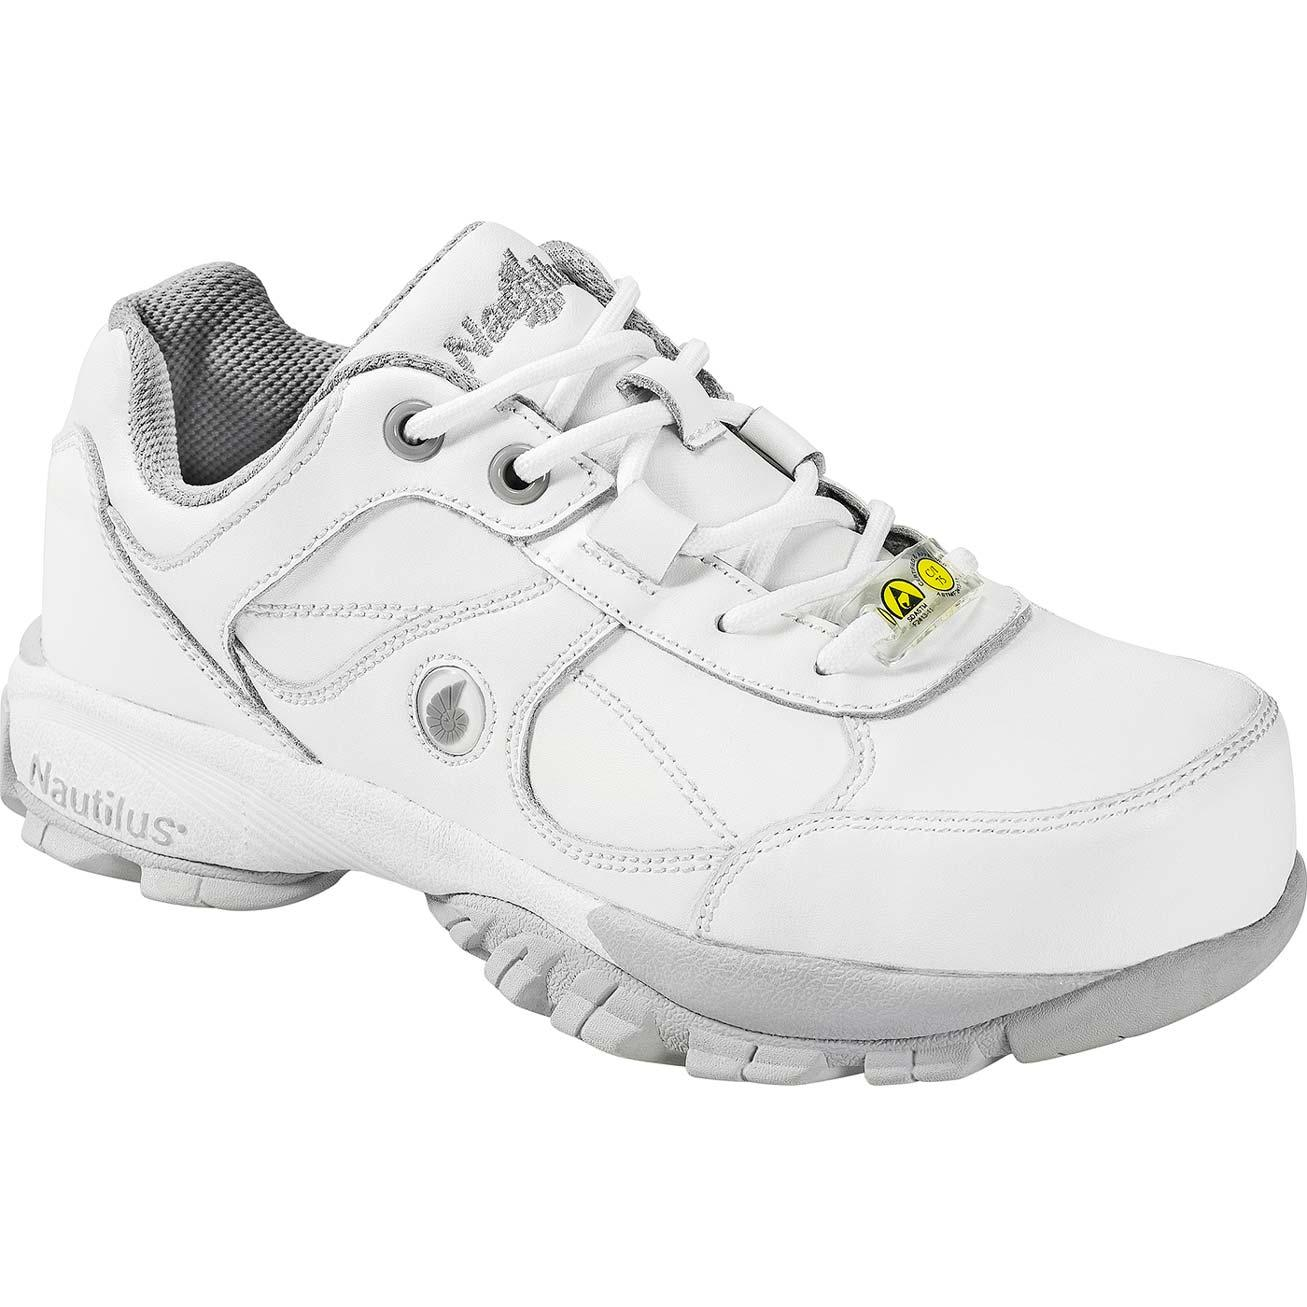 14f9e002dfa41c Nautilus Women s Steel Toe Static Dissipative Athletic Work Shoe